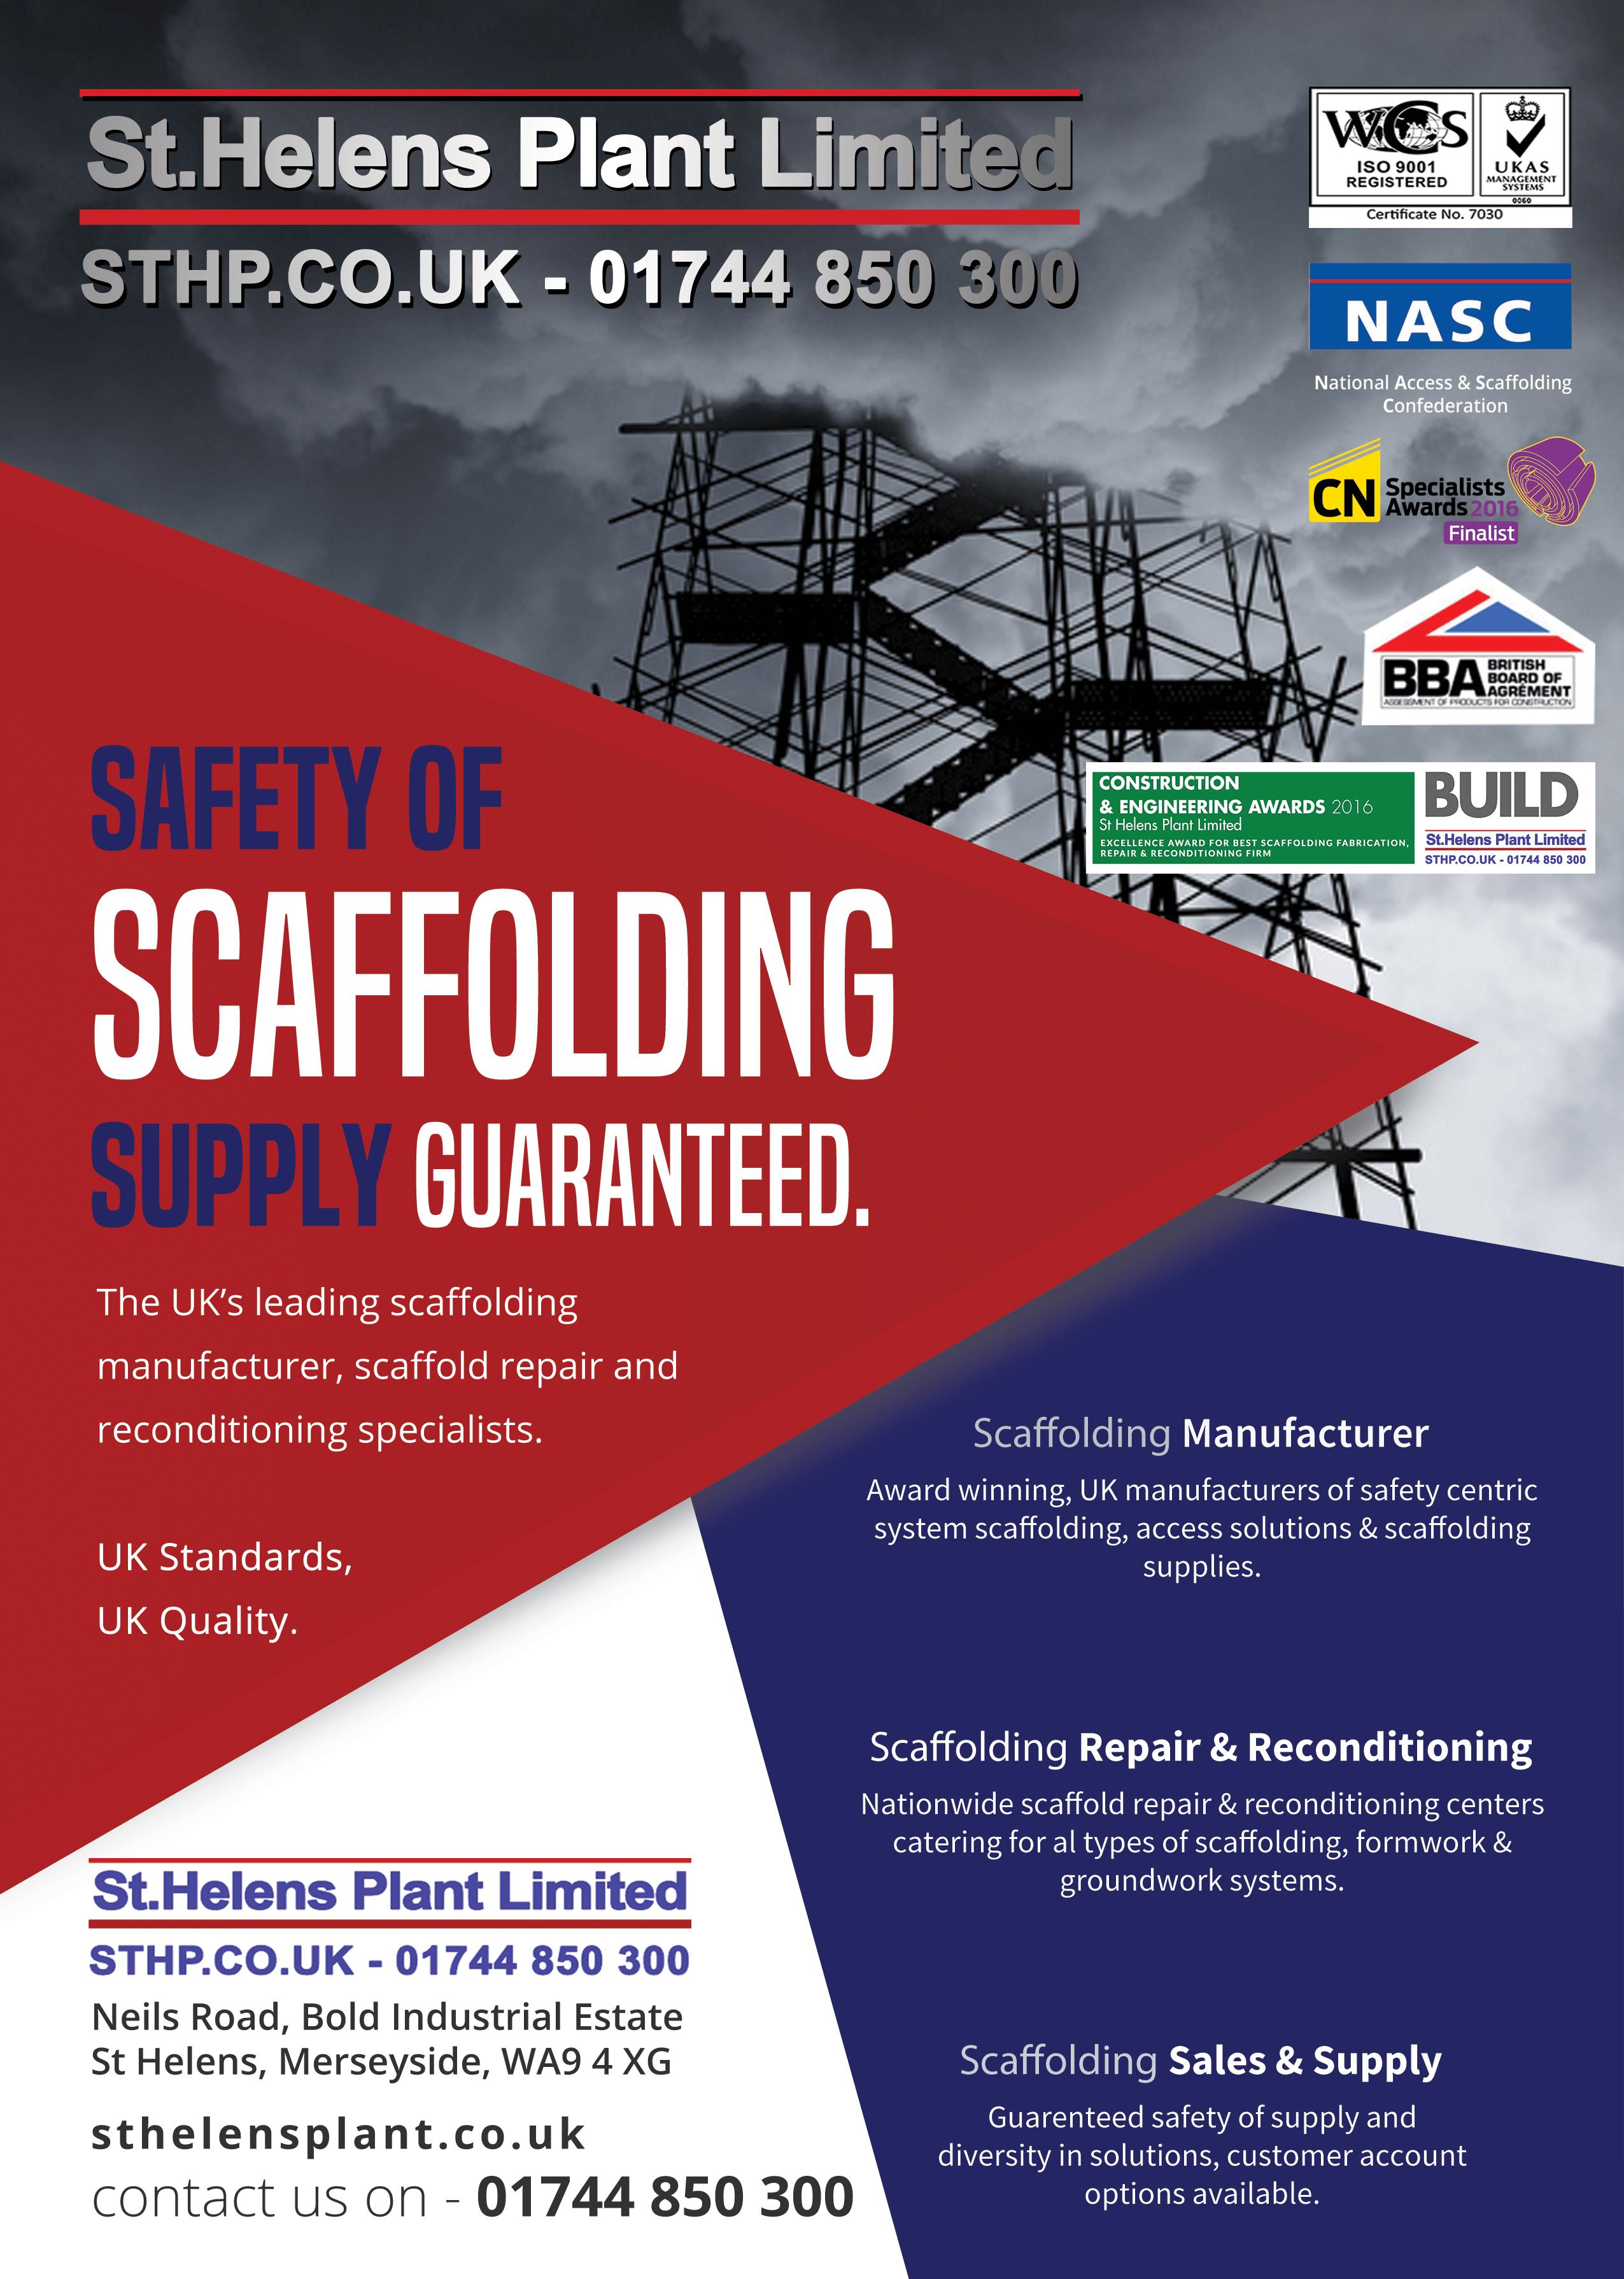 Scaffolding Supplies - Scaffolding Supplier - St Helens Plant